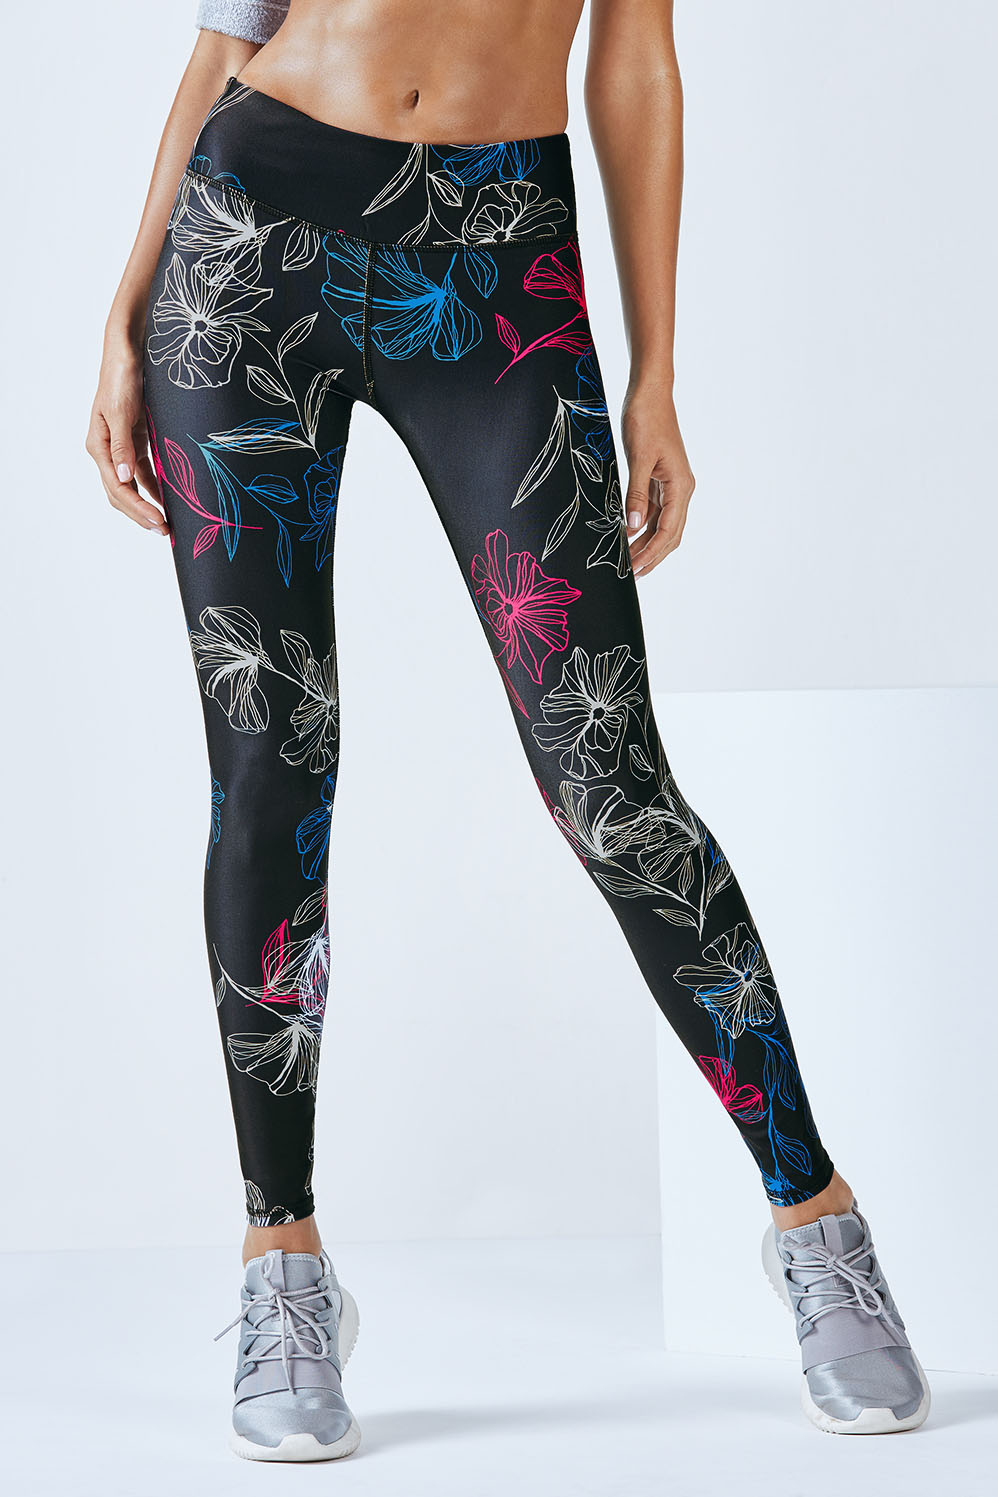 0dbd2f3bf36 Salar Printed PowerHold® Legging - blueprint floral print